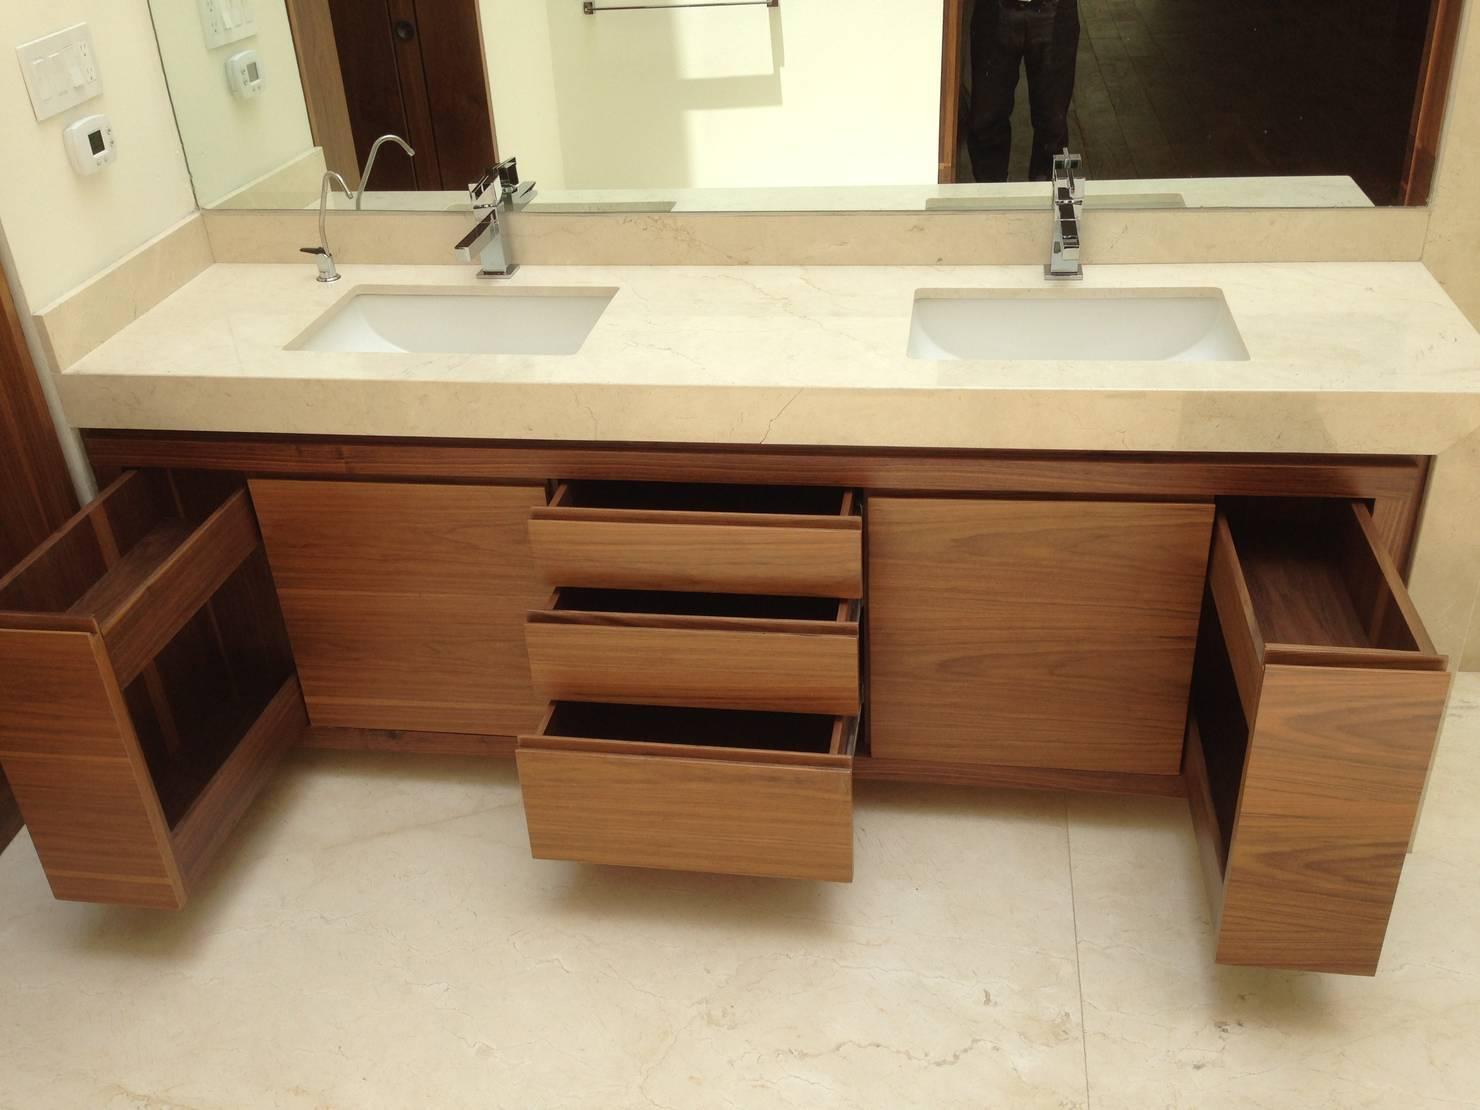 14 ingeniosos muebles de madera que vas a querer tener ya